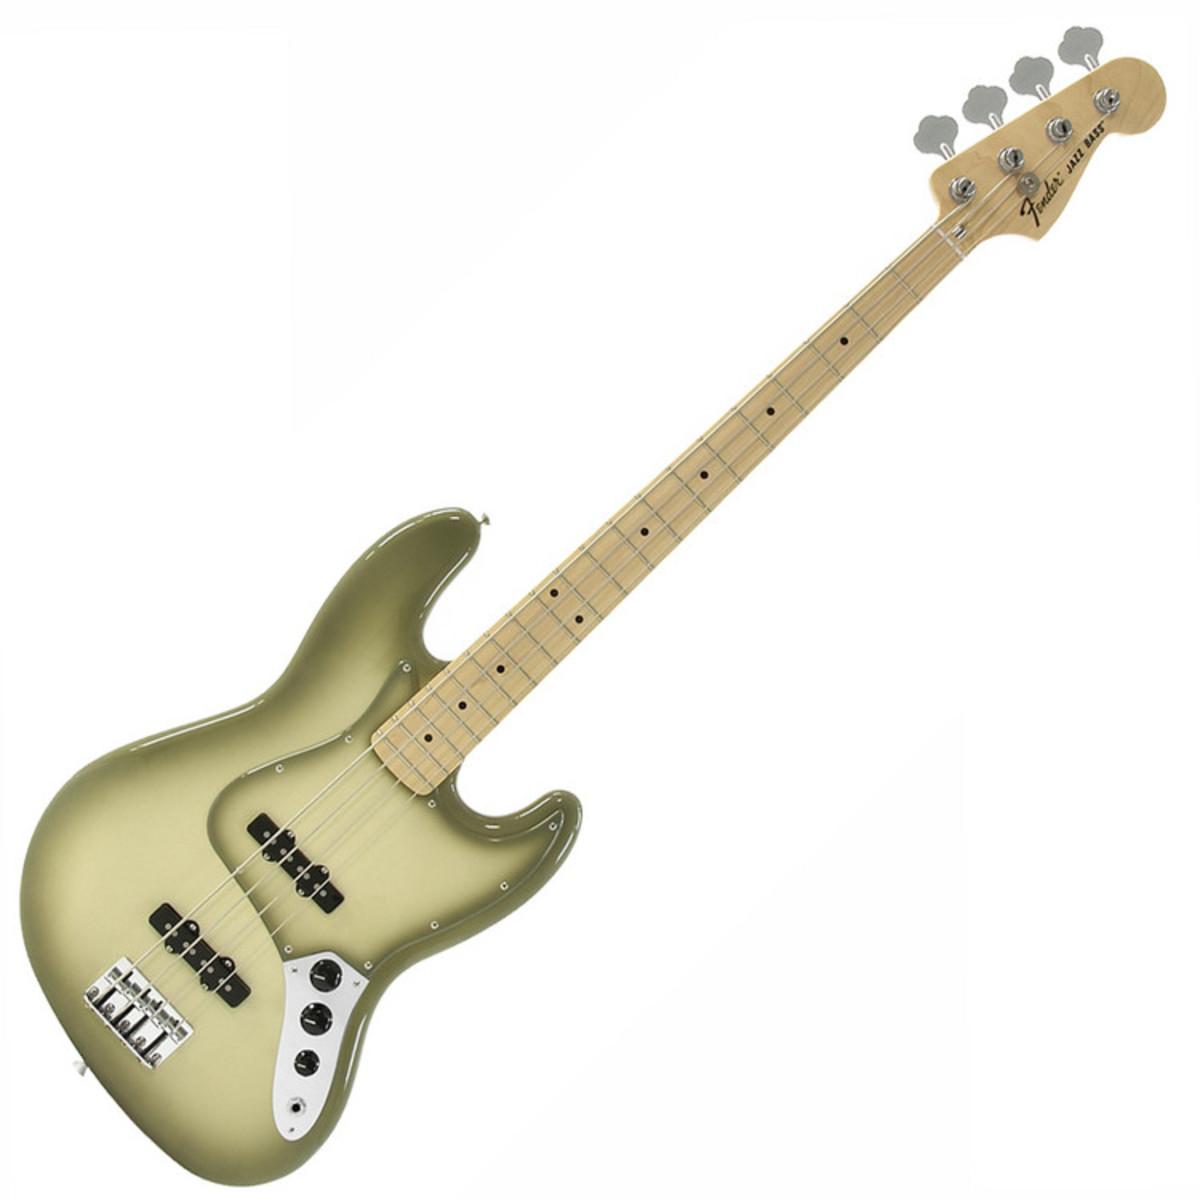 Fender Jazz B Special Japan Wiring Diagram | Wiring Library on